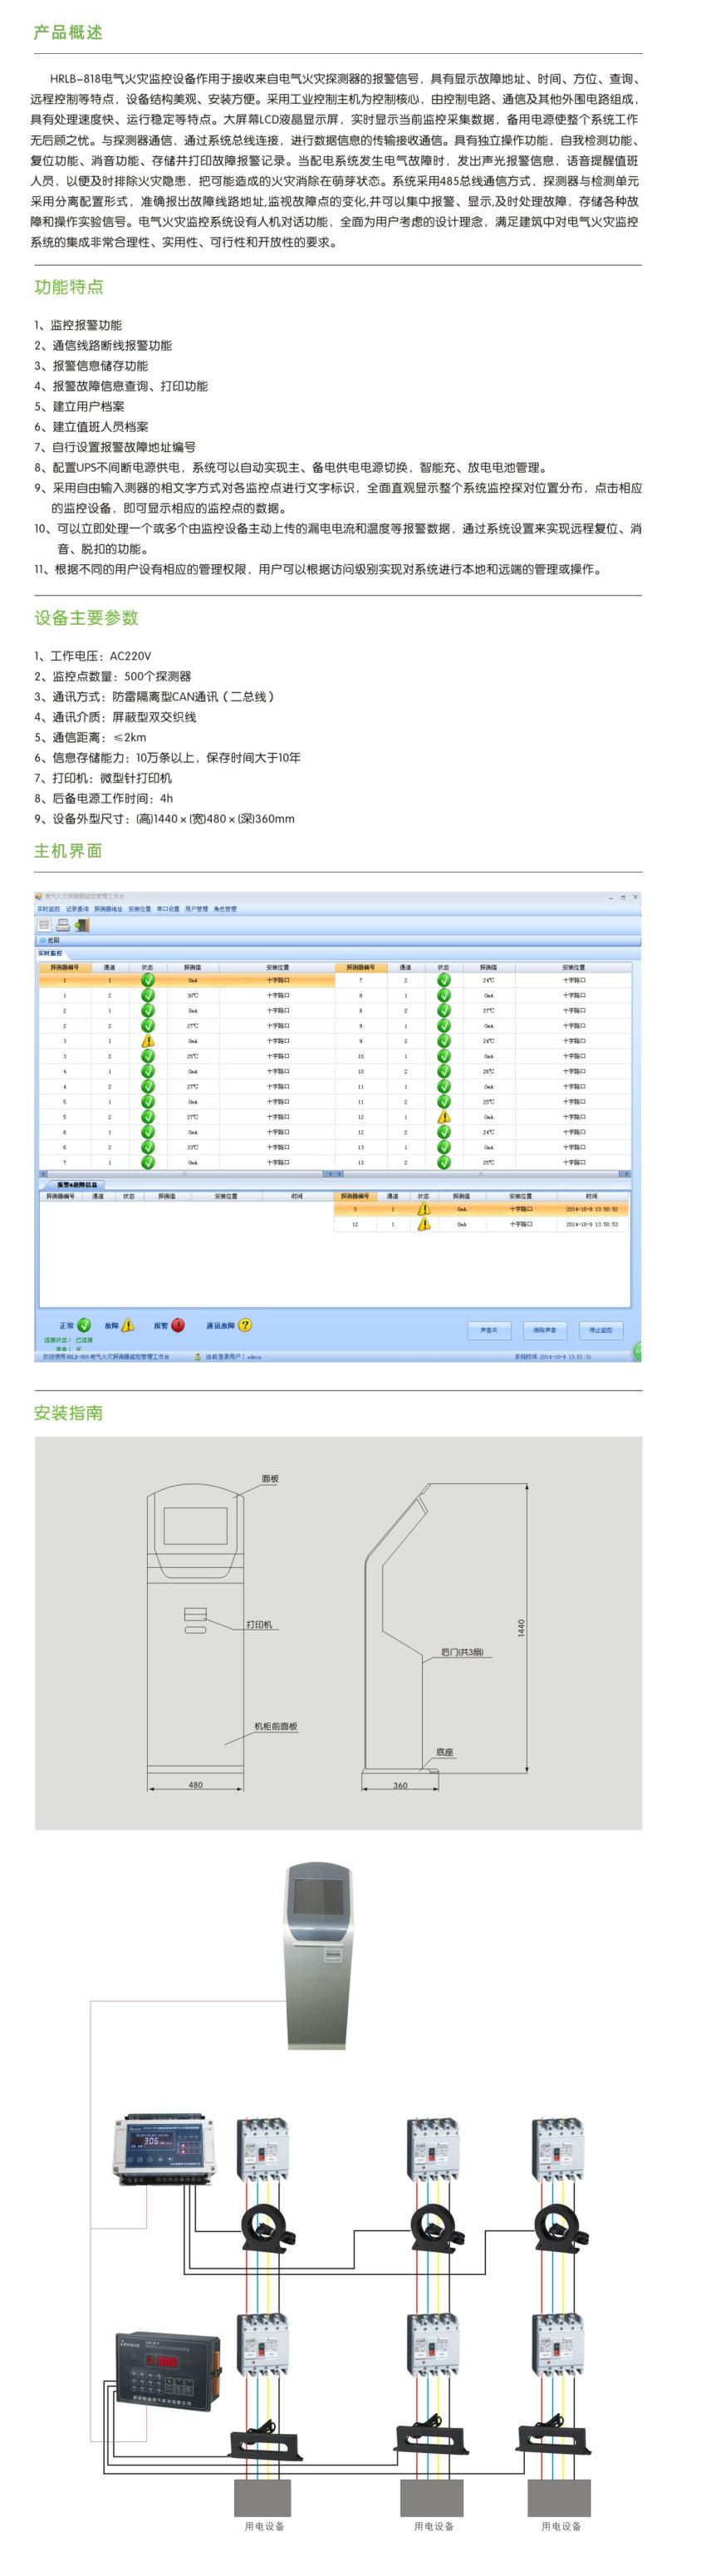 02_8_detail_HRLB-818(立柜式)电气火灾监控设备.jpg